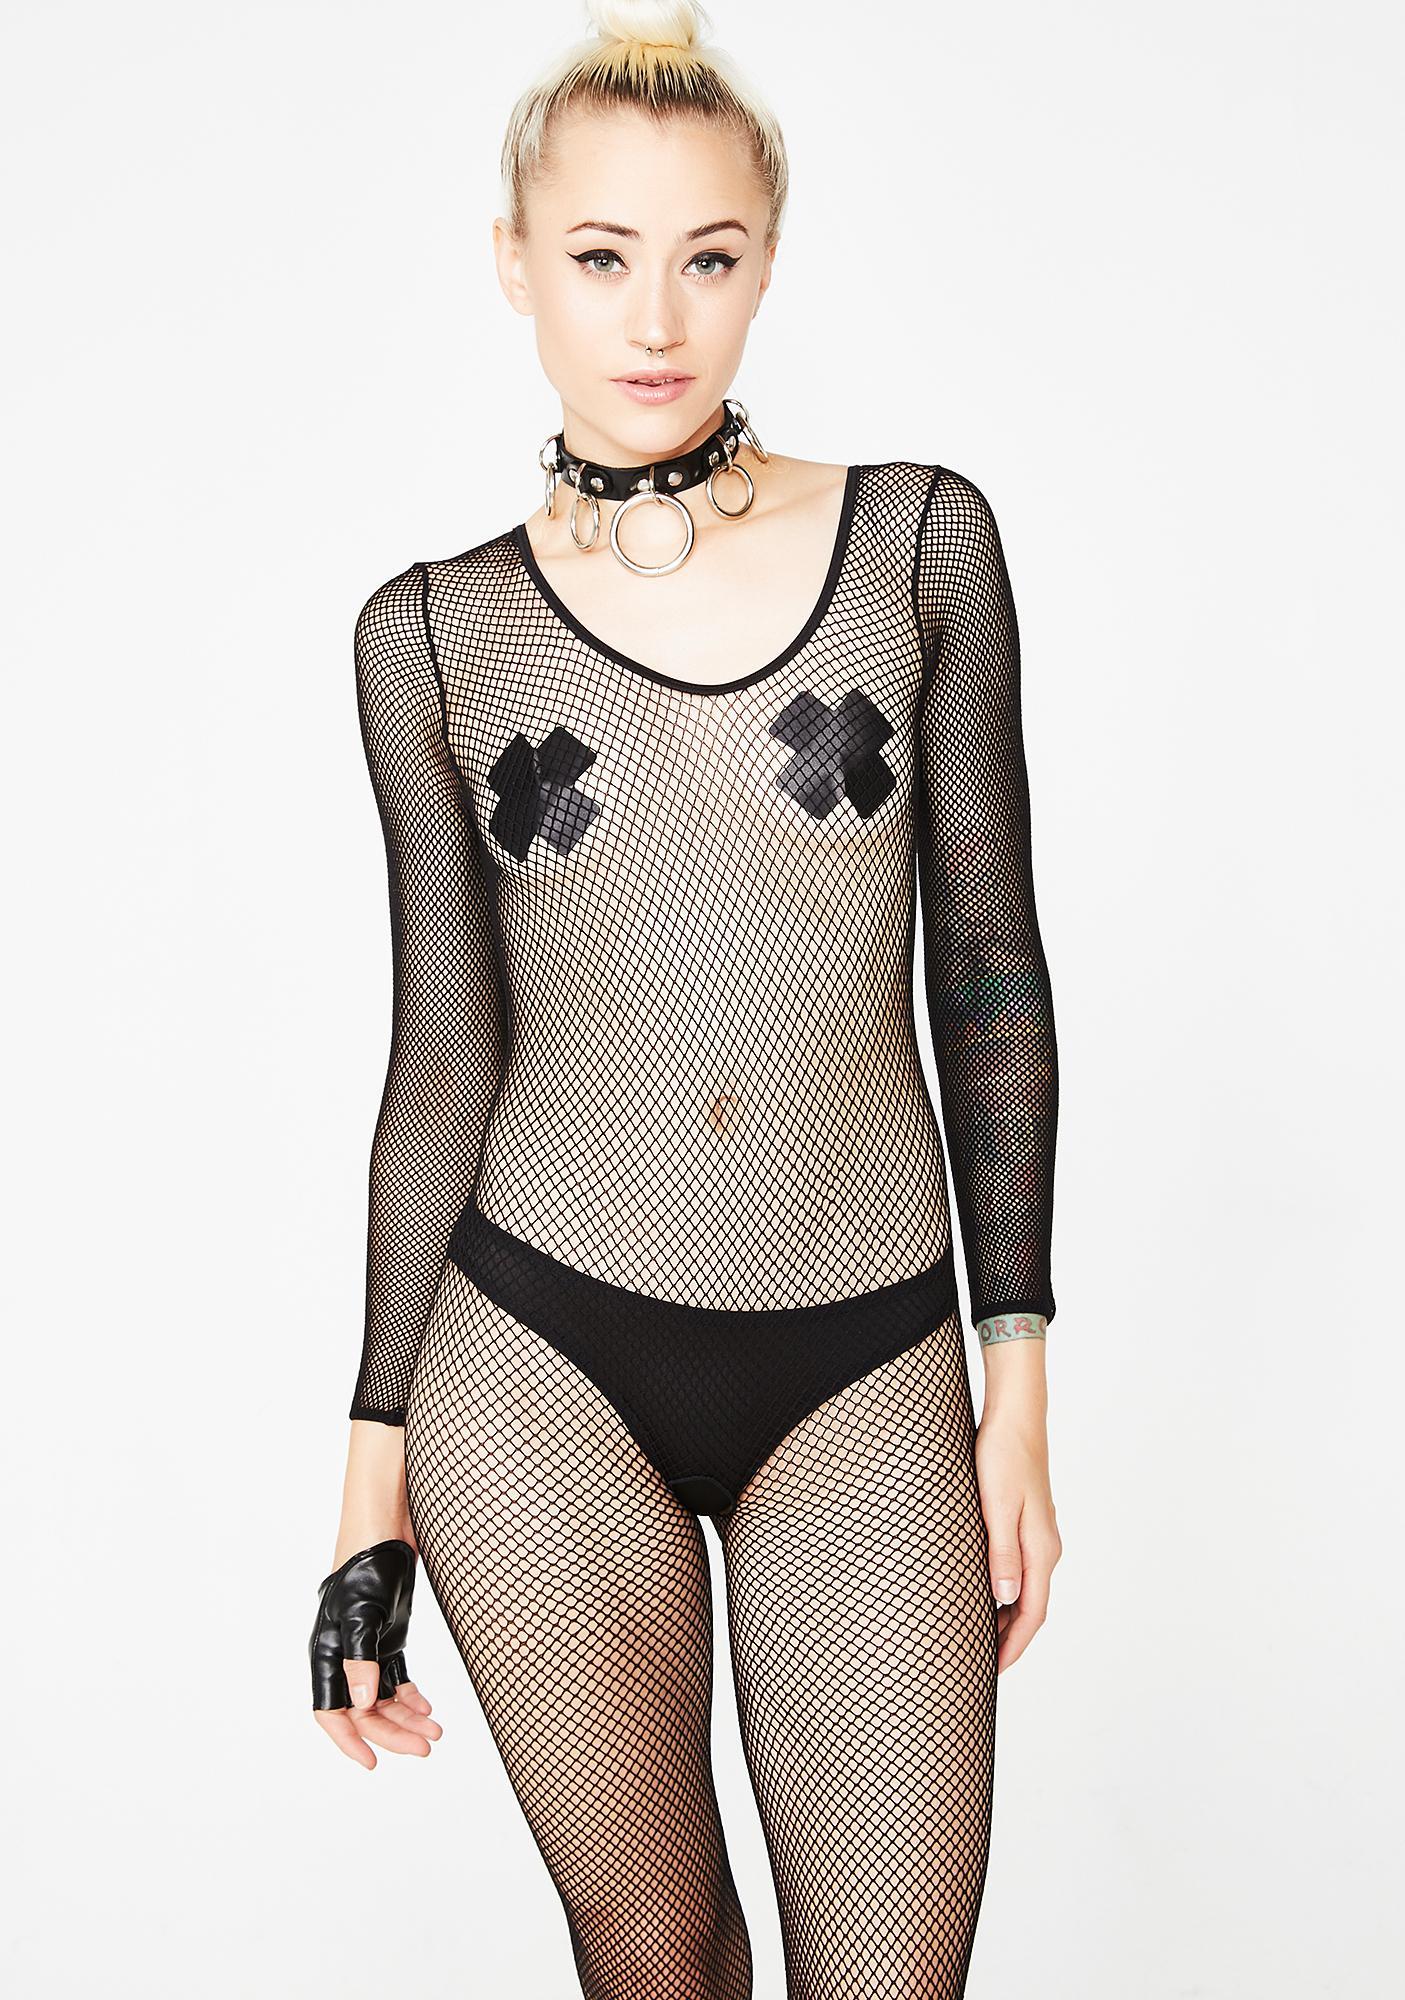 0623eb5d631 Sexy Black Fishnet Bodystocking